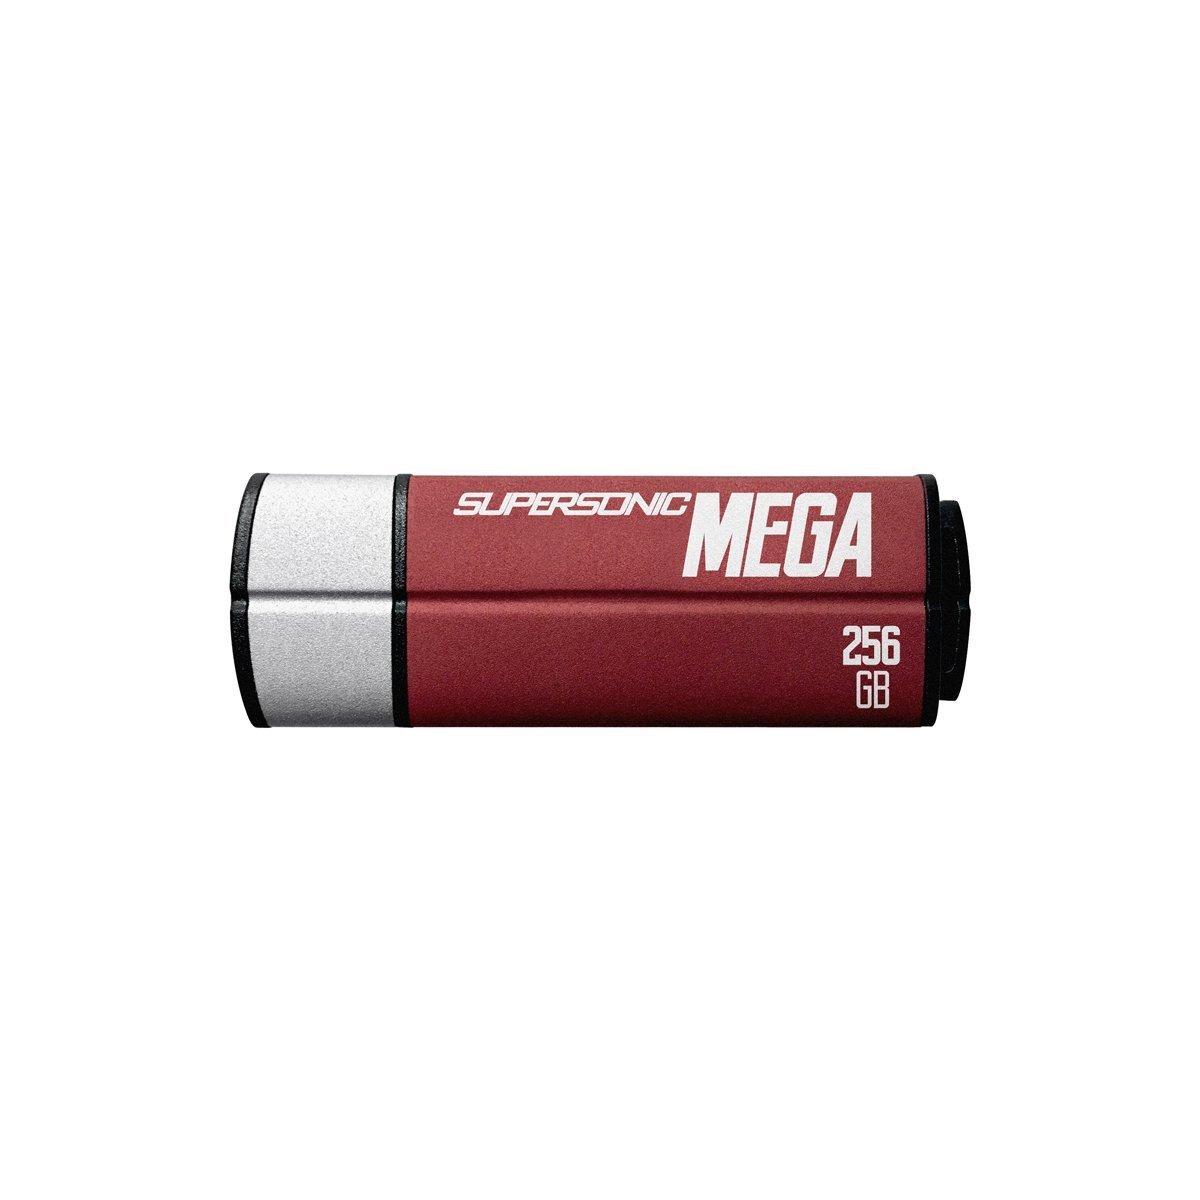 Patriot 256GB Supersonic Mega USB 3.1/USB 3.0 Flash Drive With Up To Read 380MB/sec & Write 70MB/sec- PEF256GSMGUSB